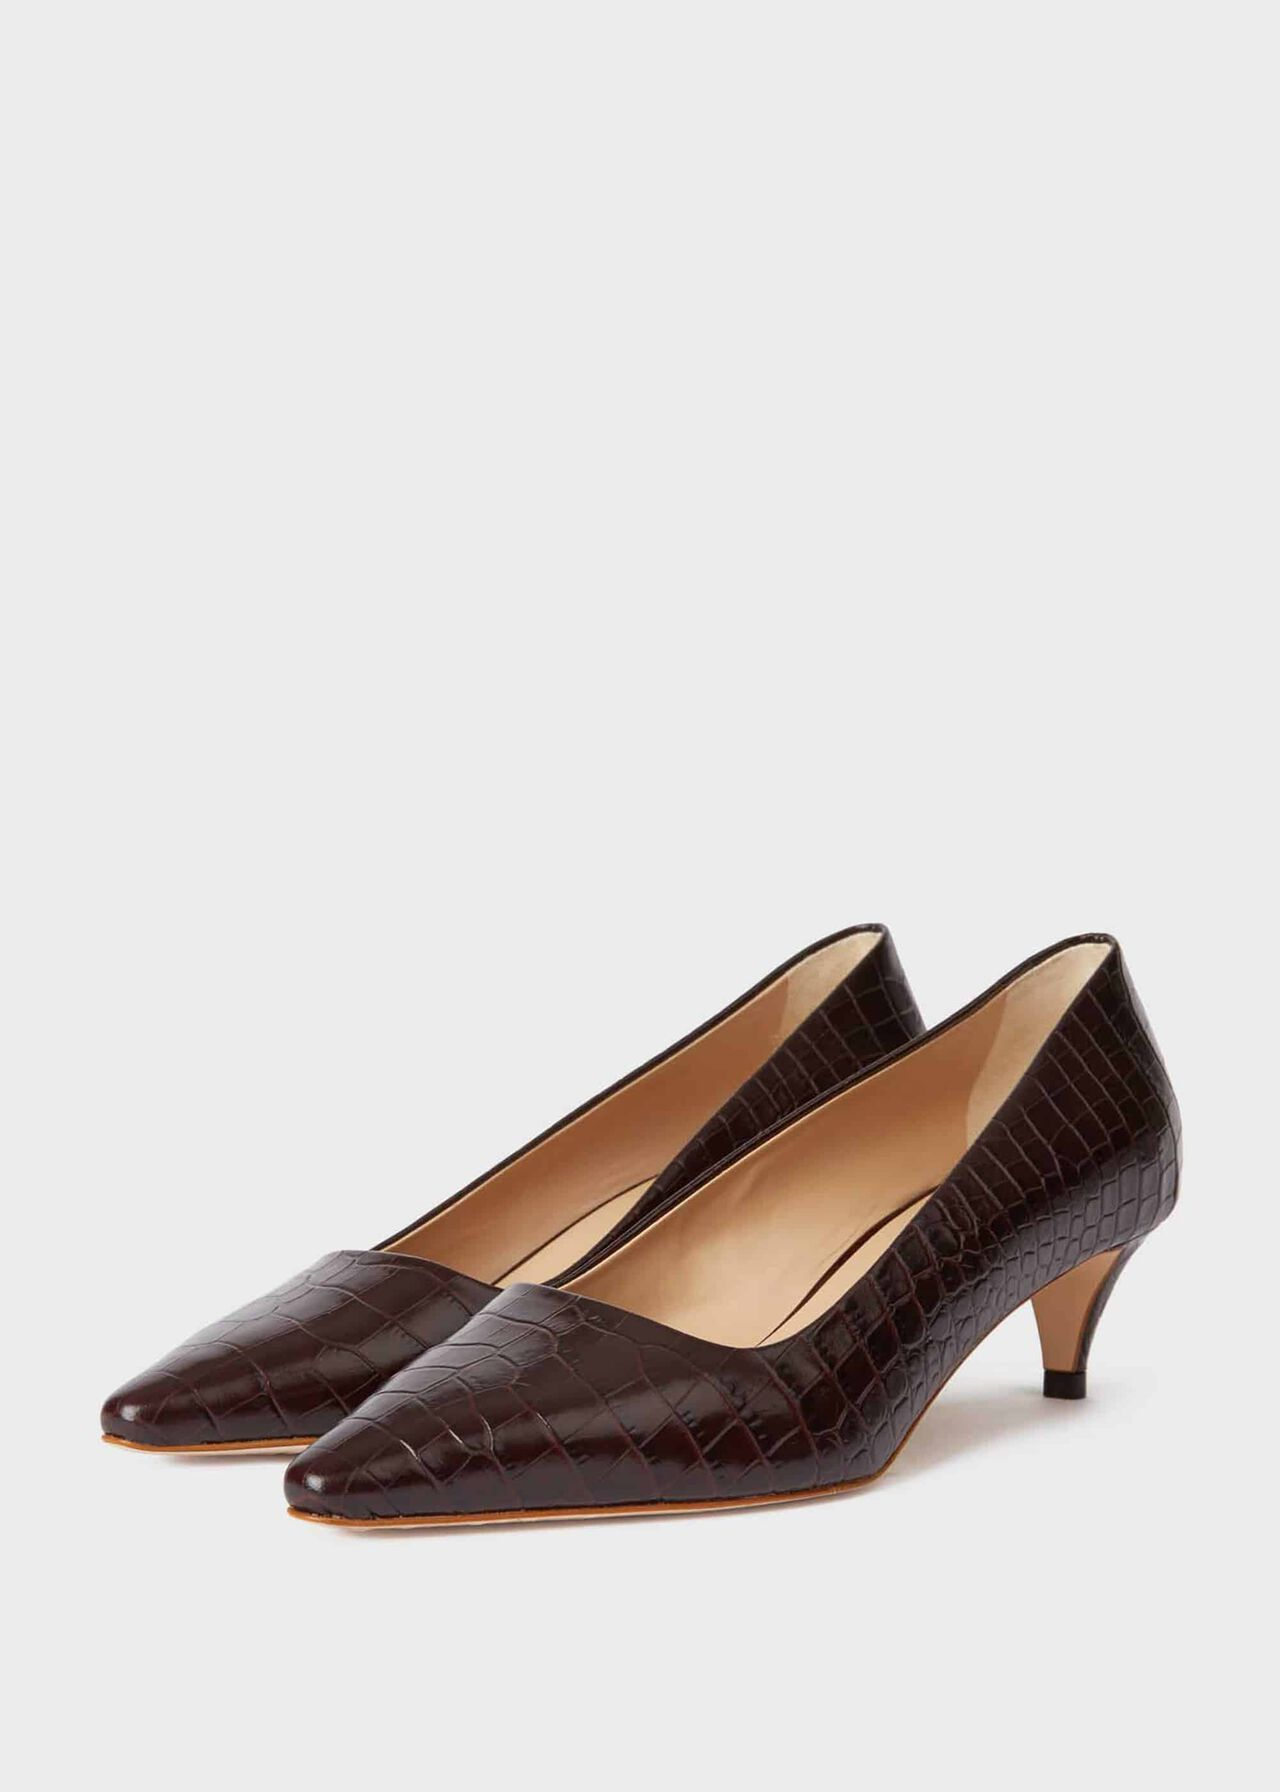 Millie Crocodile Kitten Heel Court Shoes Chocolate